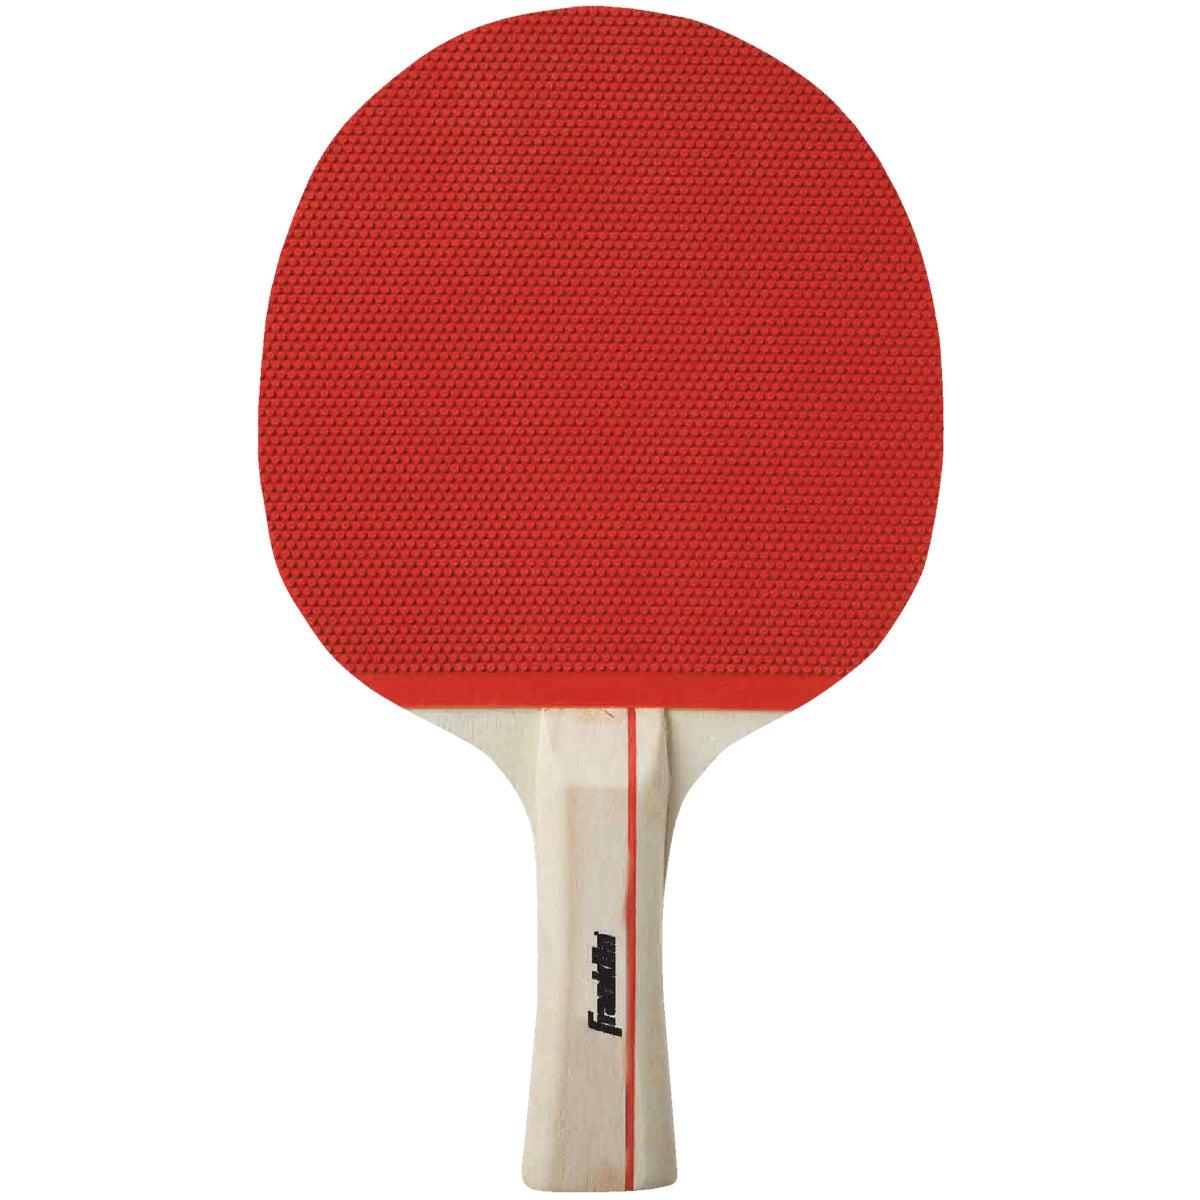 Regent Sports TABLE TENNIS PADDLE 58100